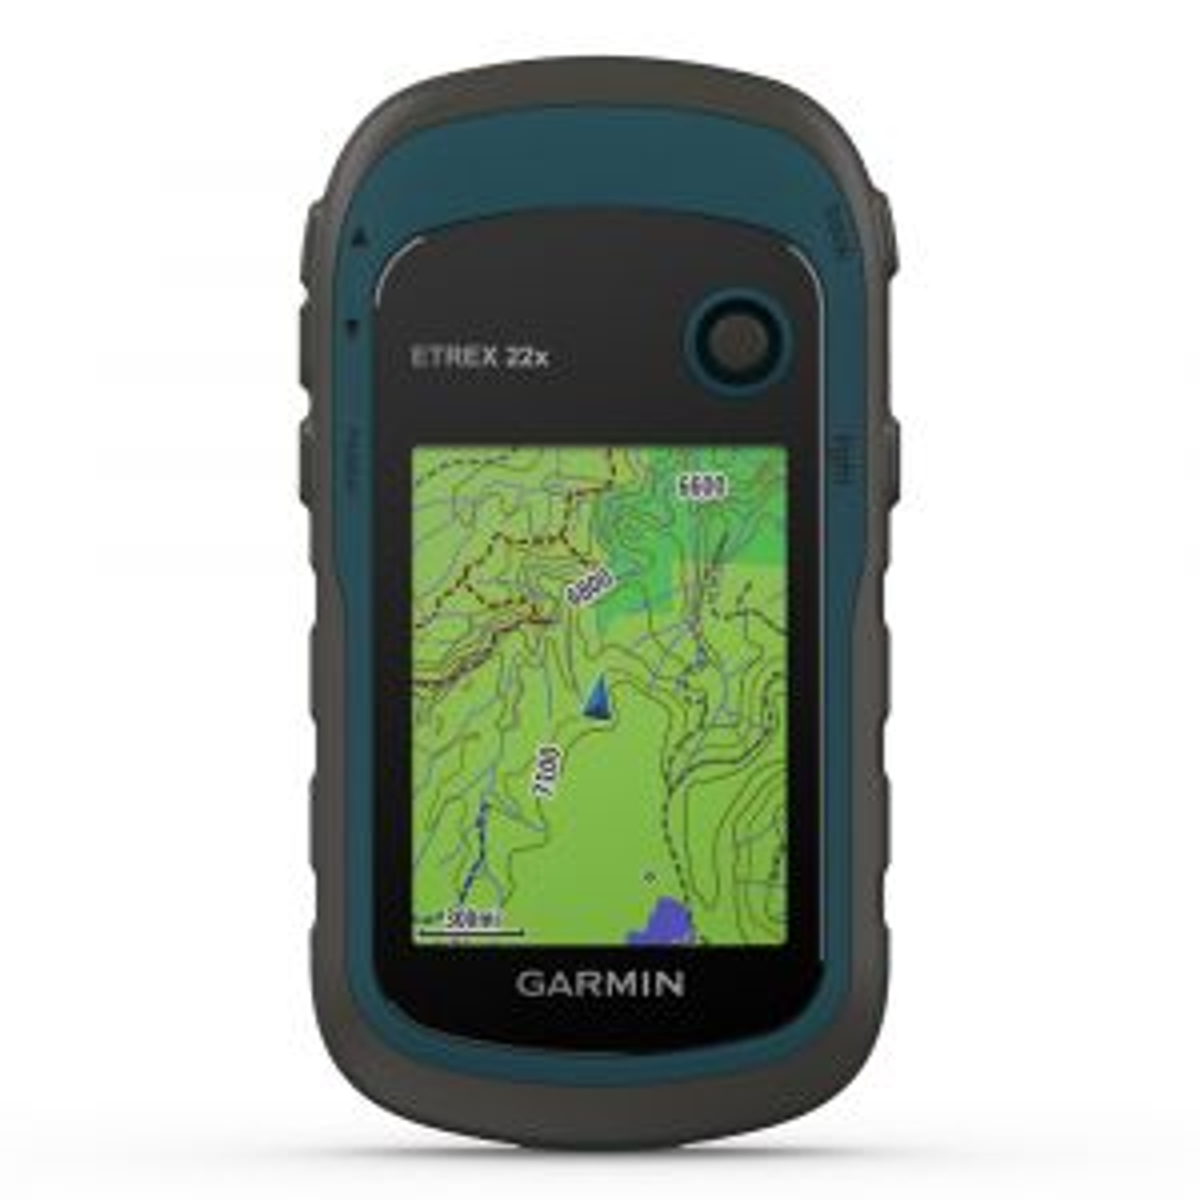 eTrex 22x Outdoornavigation GPS-Handgerät